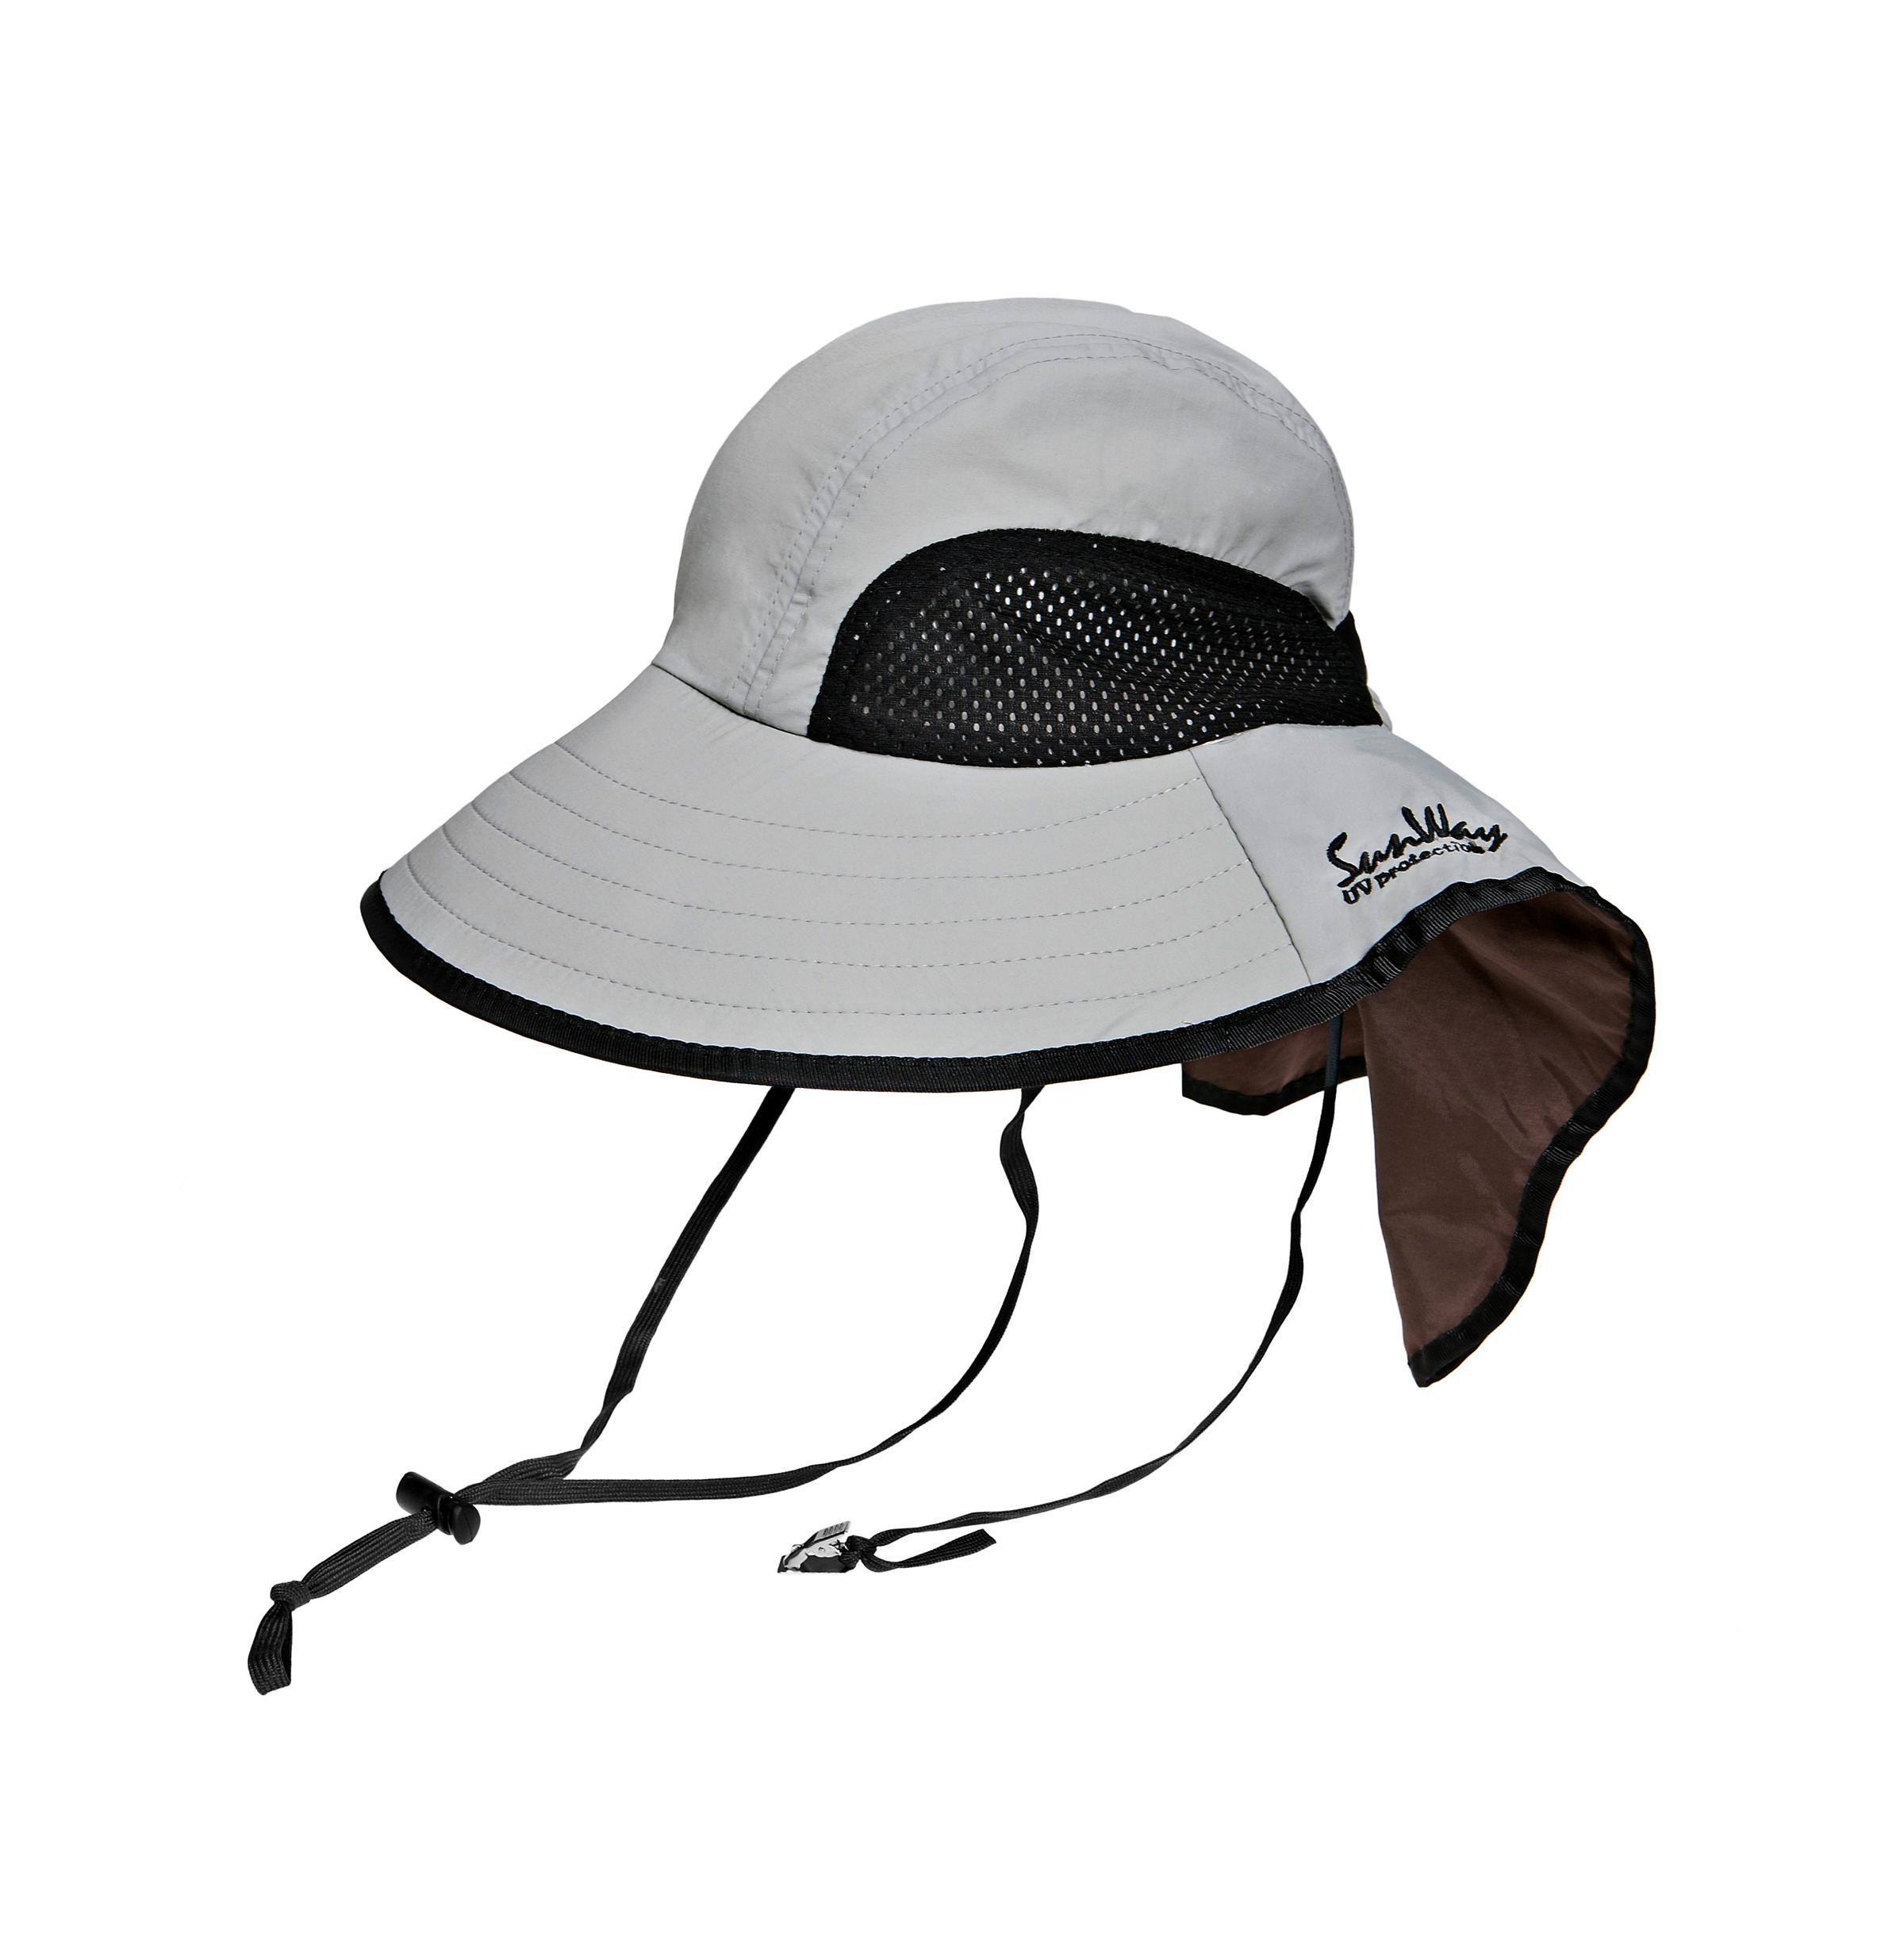 e2586937 SunWay's UV Protective Hats: Adult Gray Wide Brim Hat